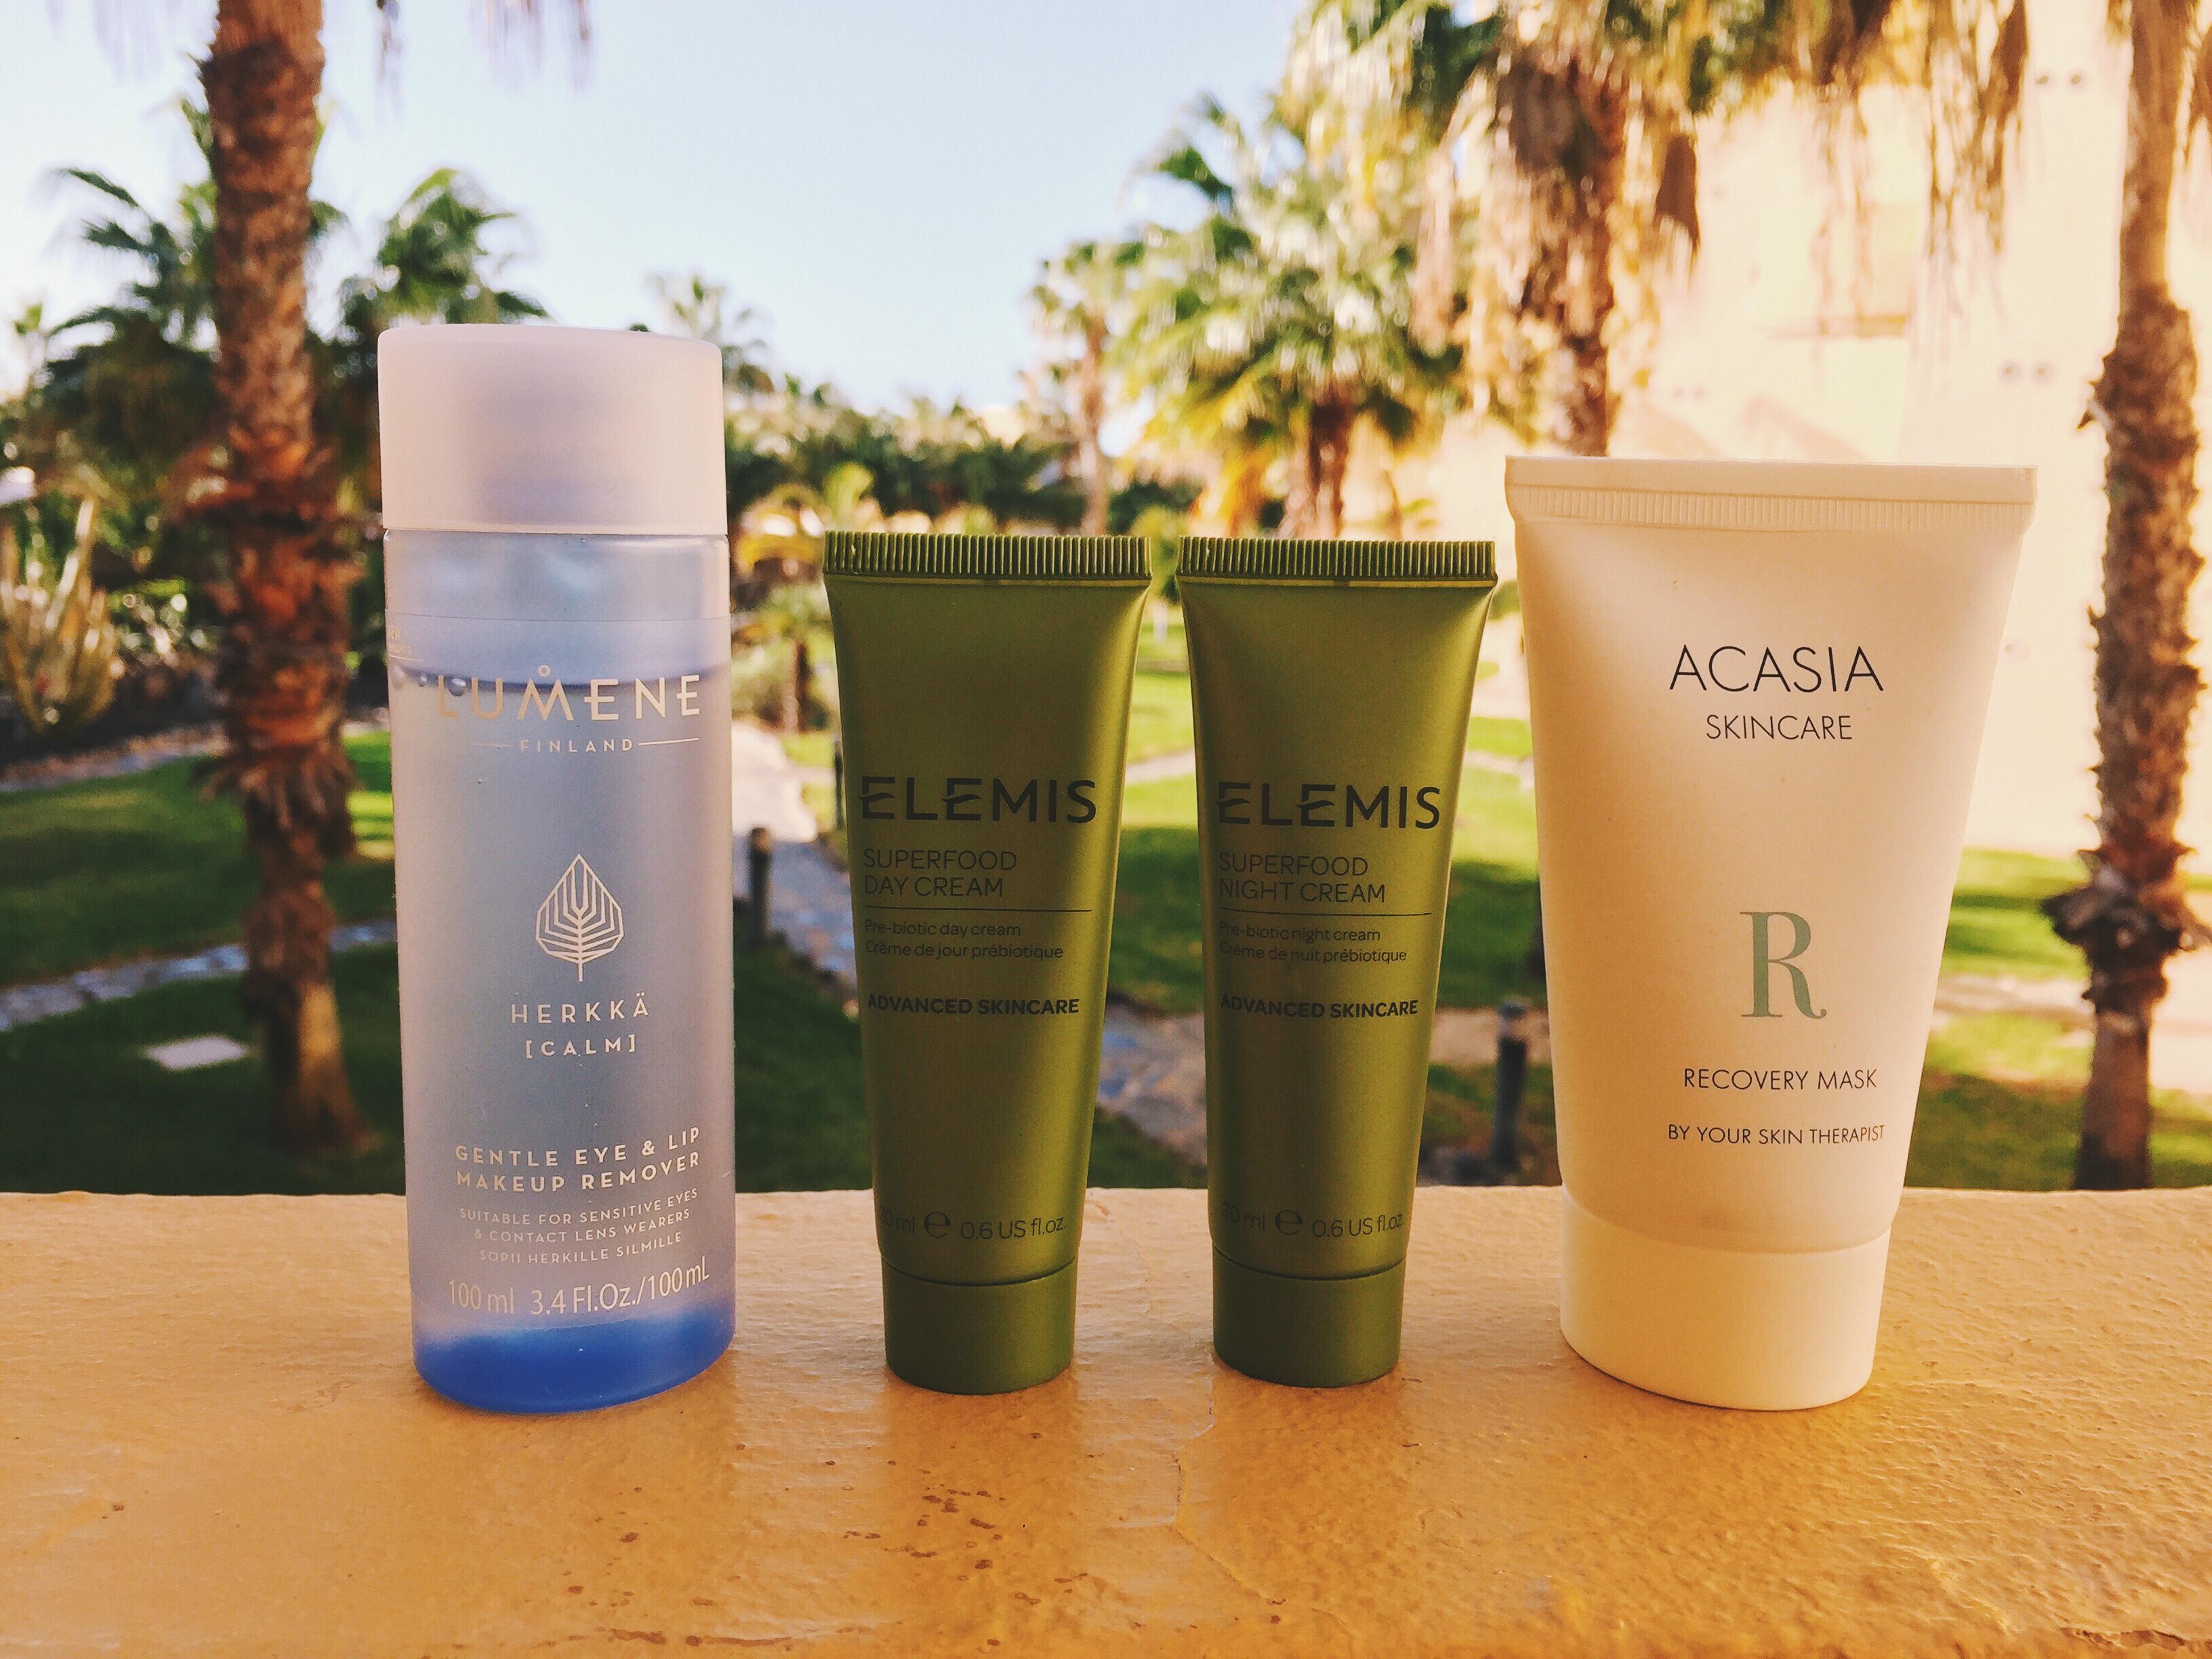 hudvård utomlands solen semester lumene elemis acasia